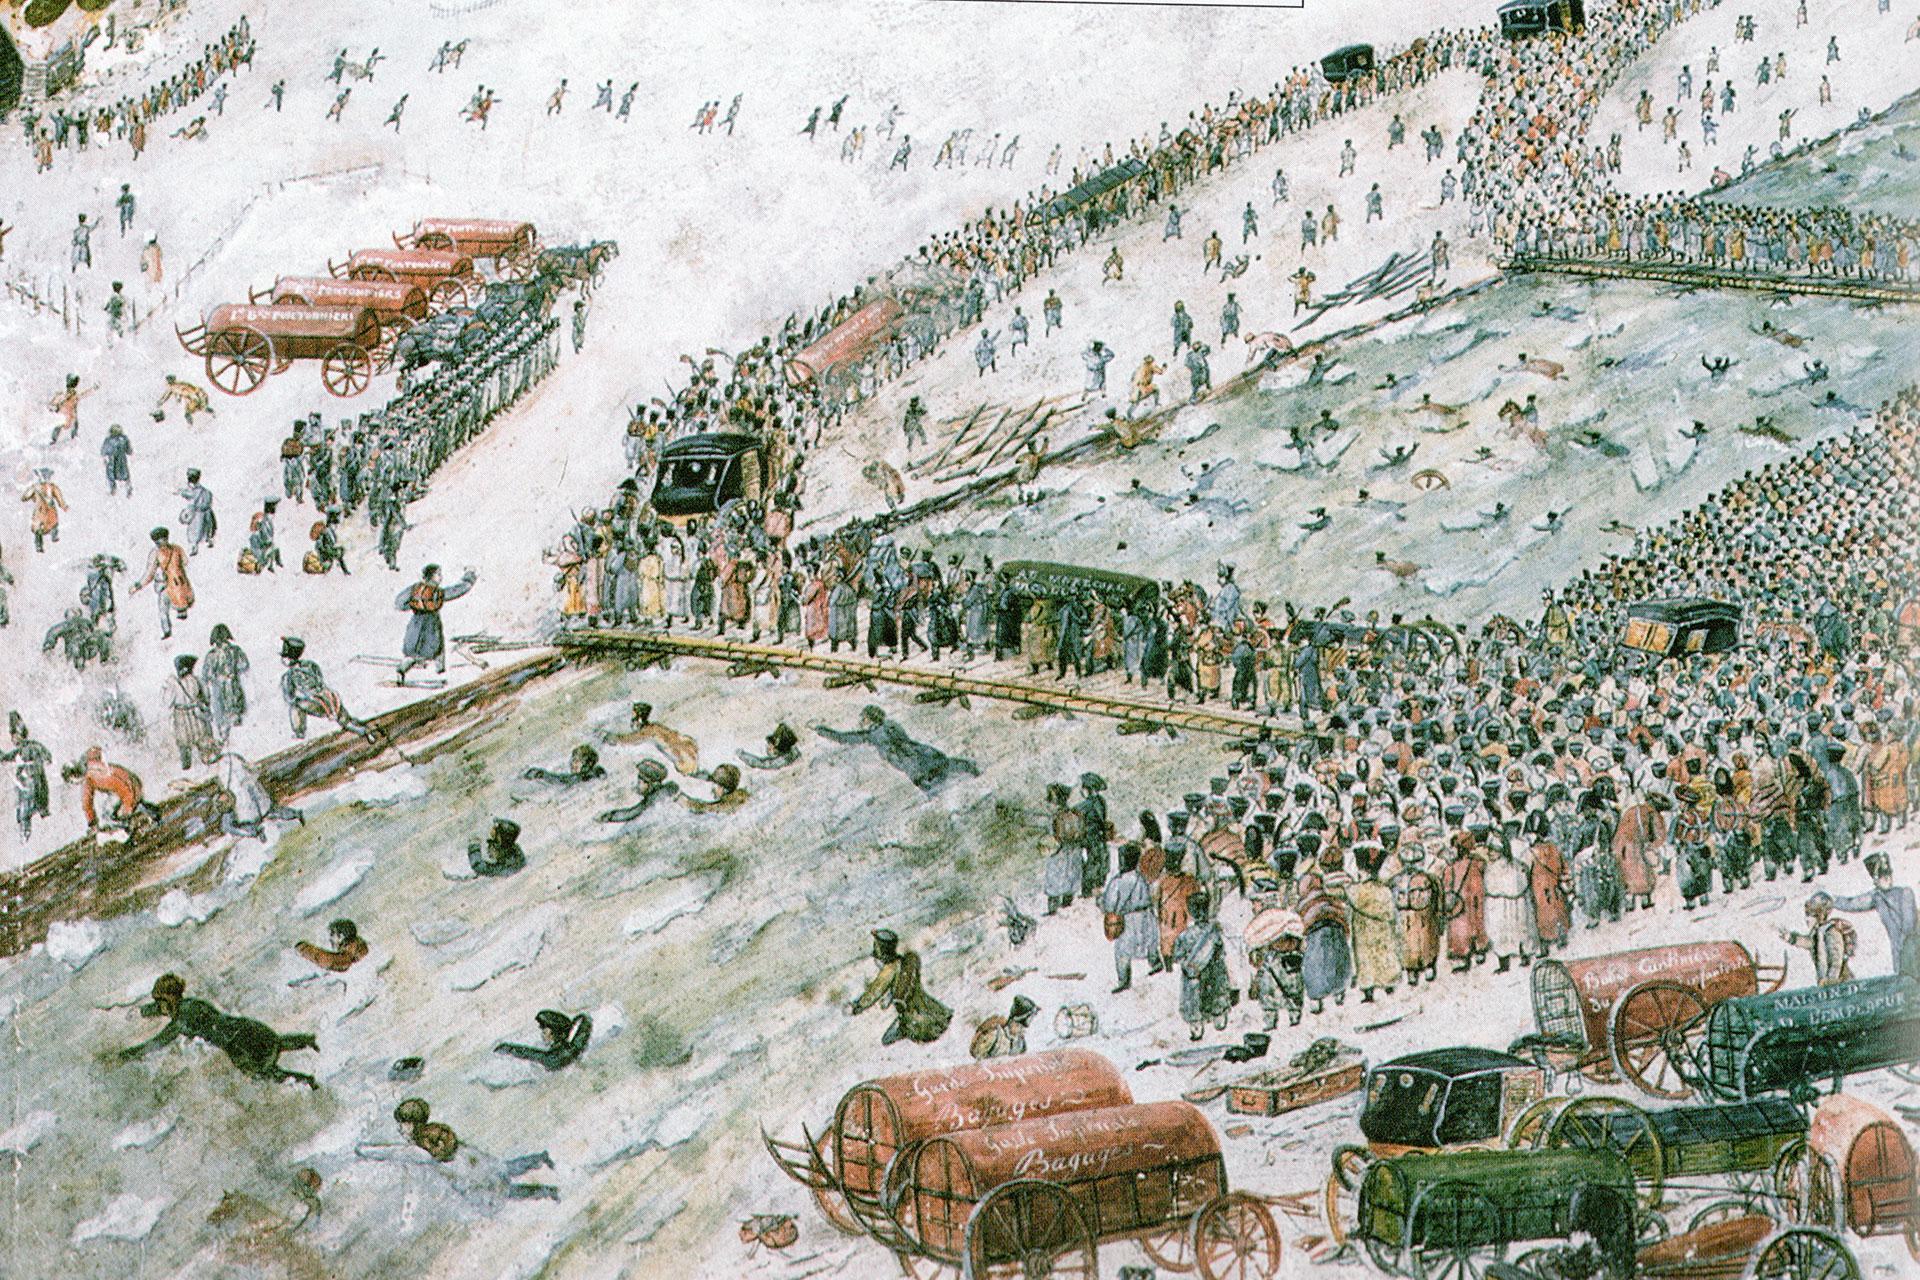 Napoleon's crossing point near Studianka.